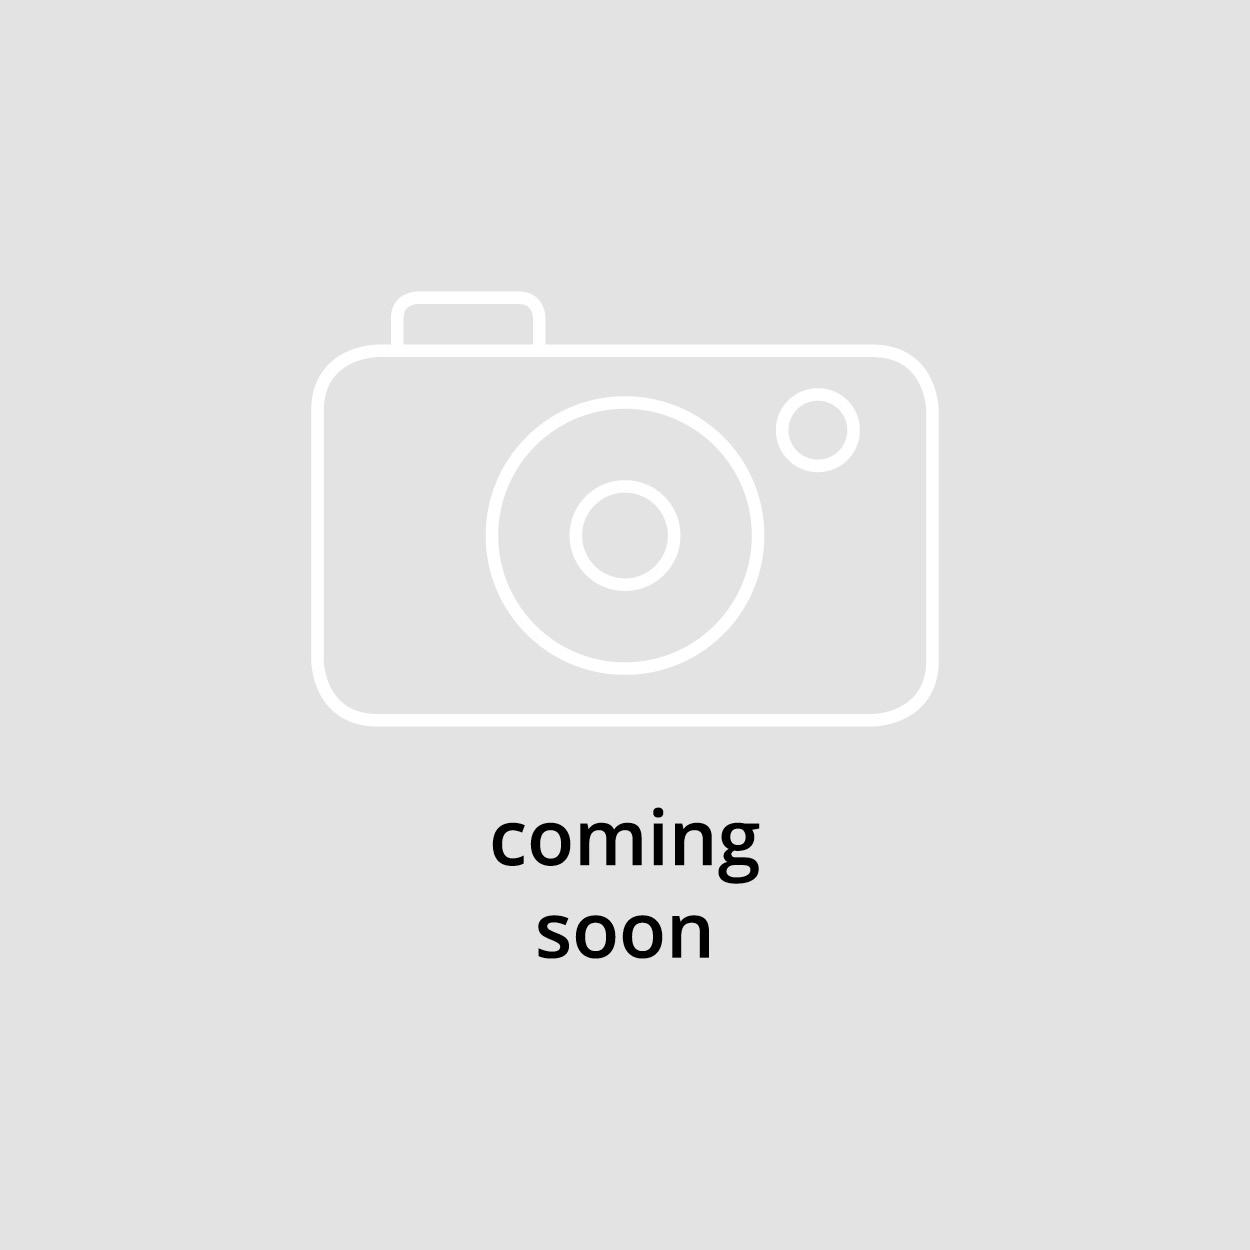 880700 Portautensile prismatico modulare per Gildemeister  IMIS08, AS16, AS20,GS20,GM20, GM20AC